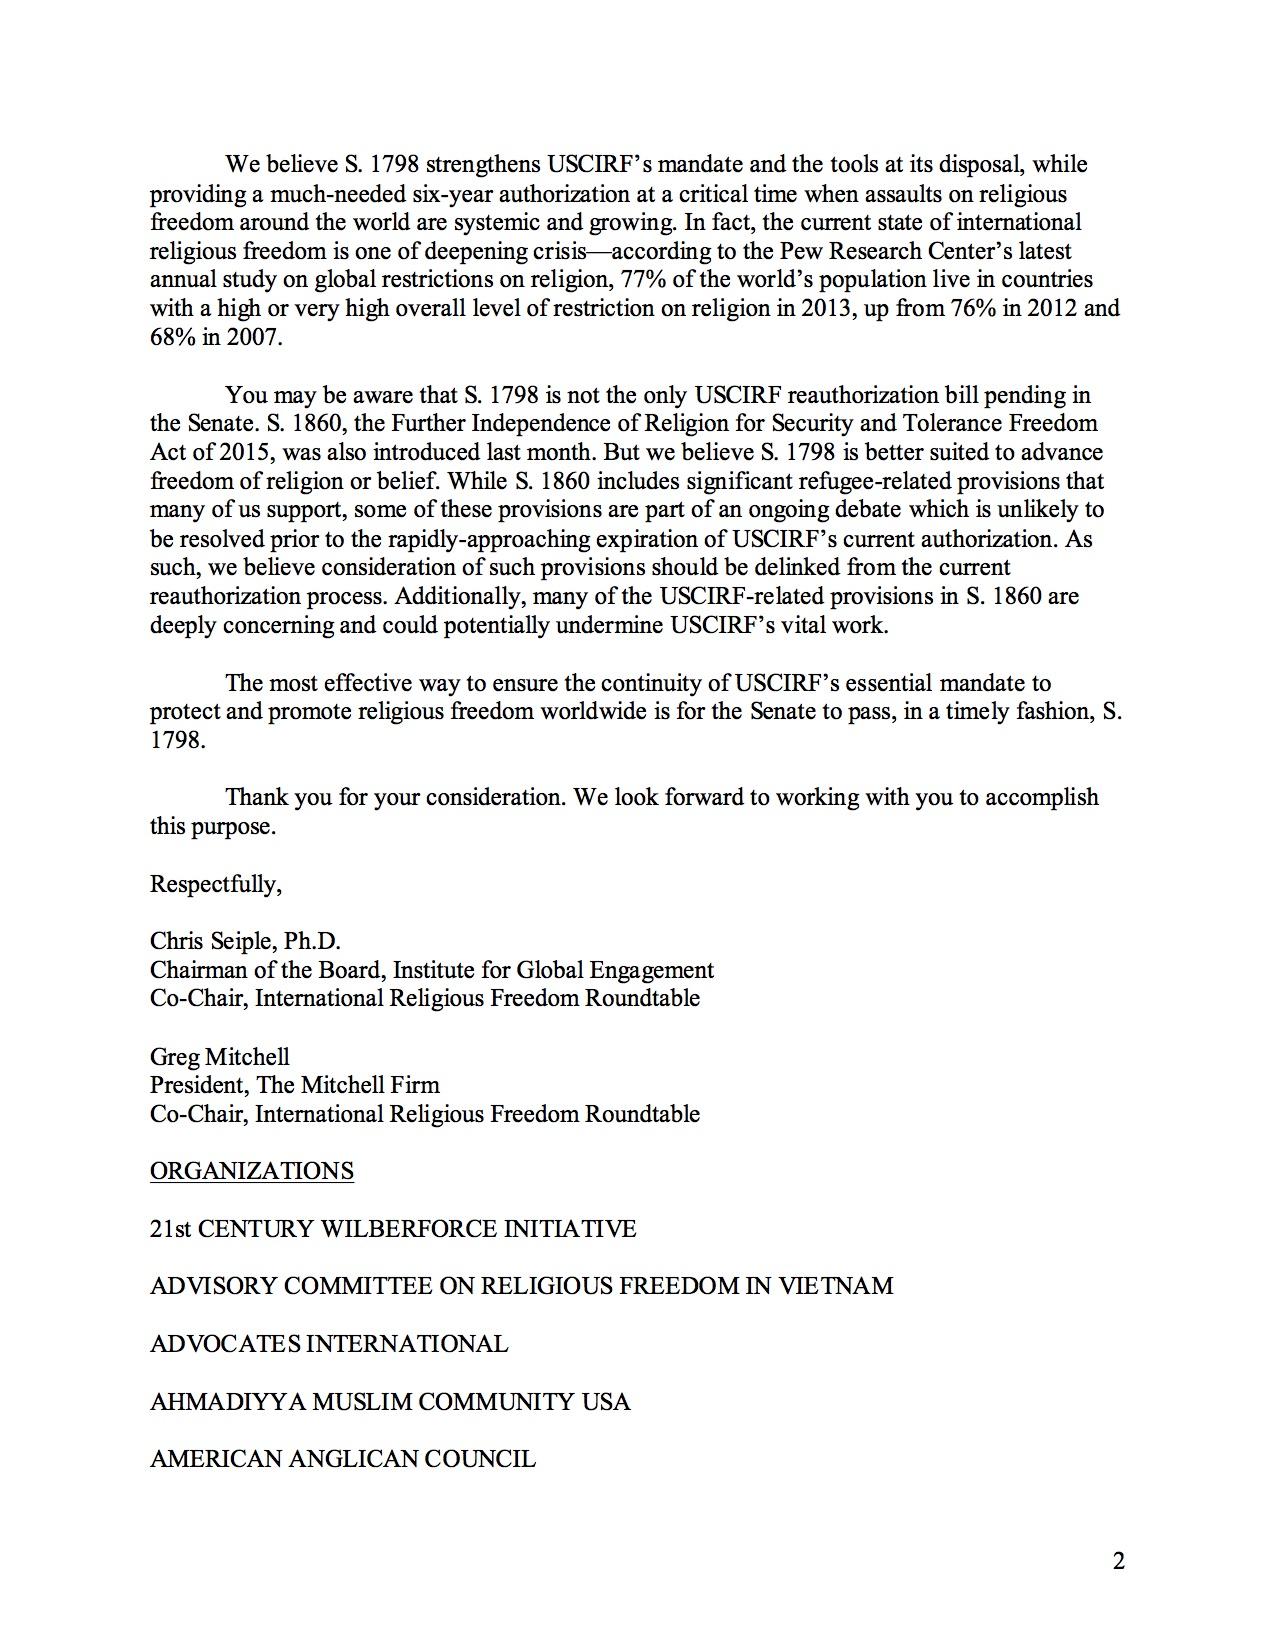 S_1798_USCIRF_Reauth_Letter_Sept9_2015